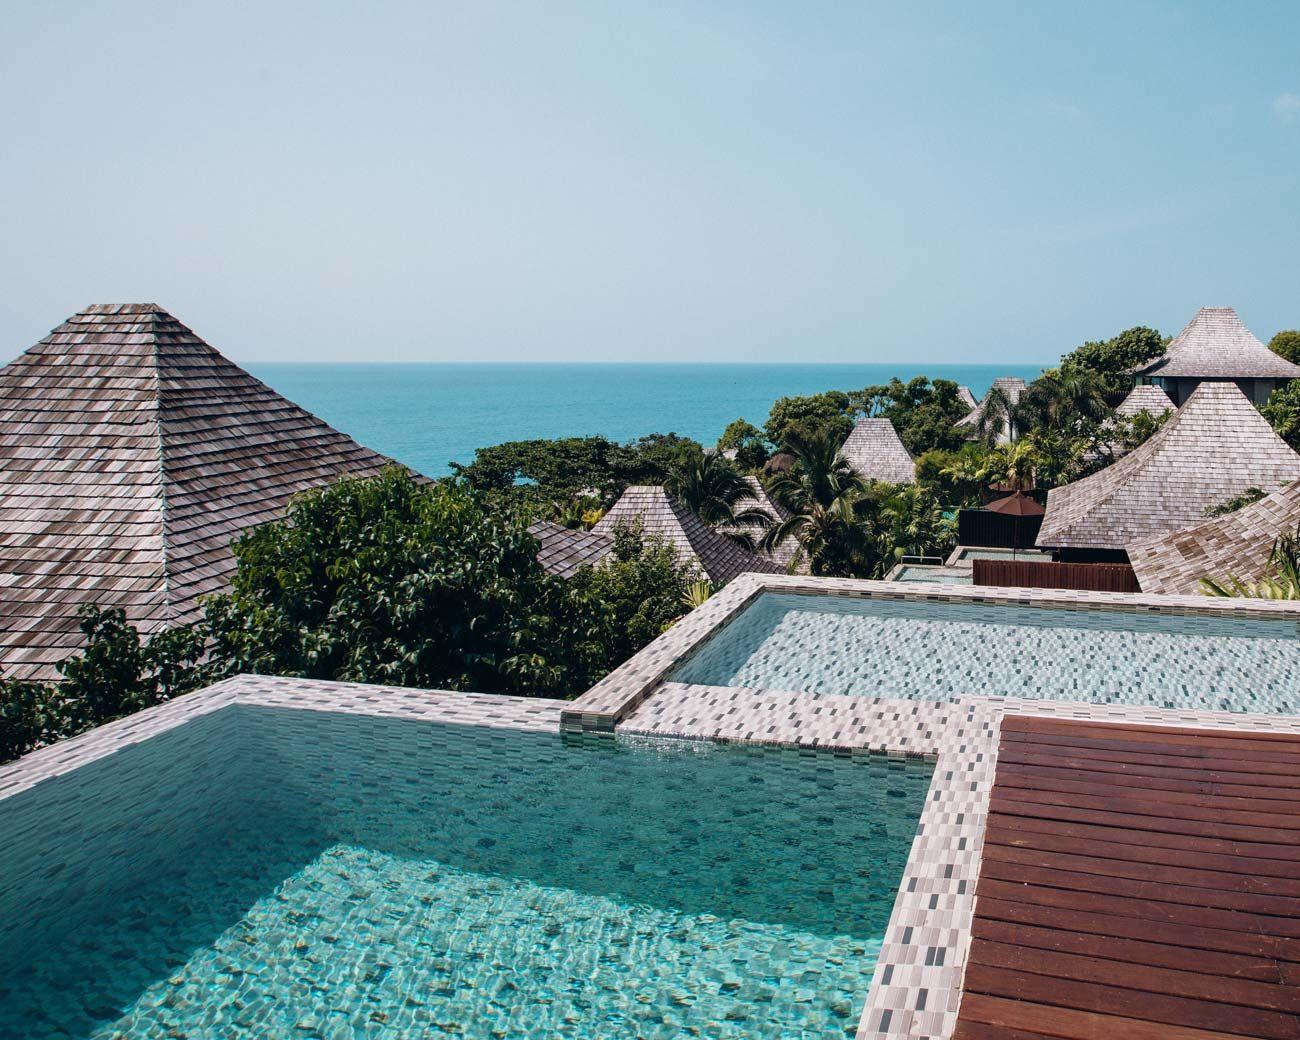 Silavadee Pool Spa Resort In Koh Samui Thailand Resort Spa Spa Pool Koh Samui